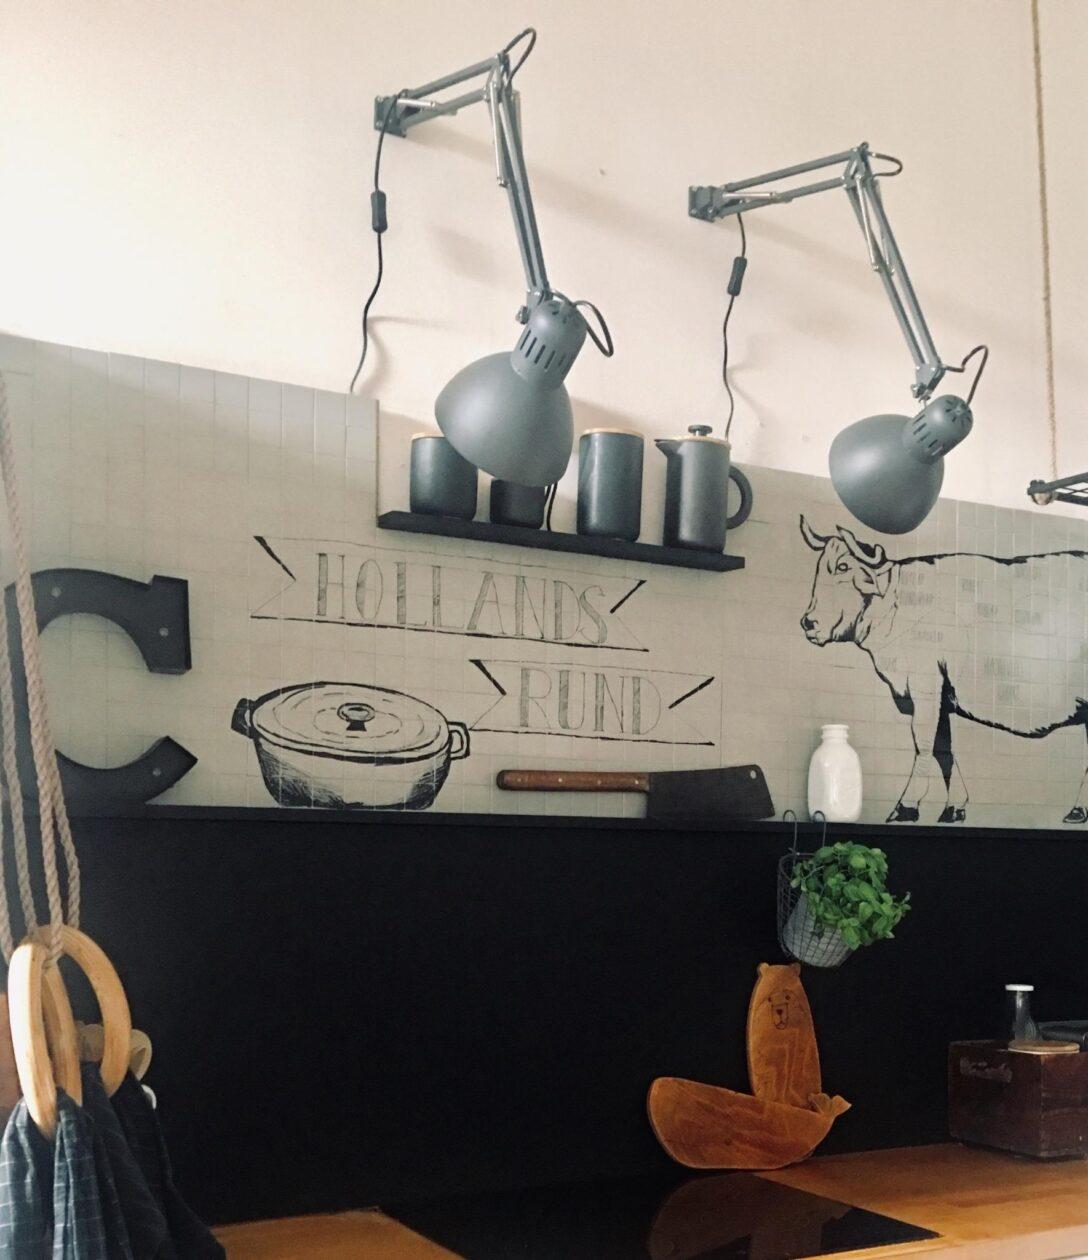 Large Size of Fliesen Rückwand Küche Ausaltmachneukcherckwandfliesendiykruterlam Blende Salamander Glas Holz Modern Lüftung Waschbecken Moderne Landhausküche Sideboard Wohnzimmer Fliesen Rückwand Küche